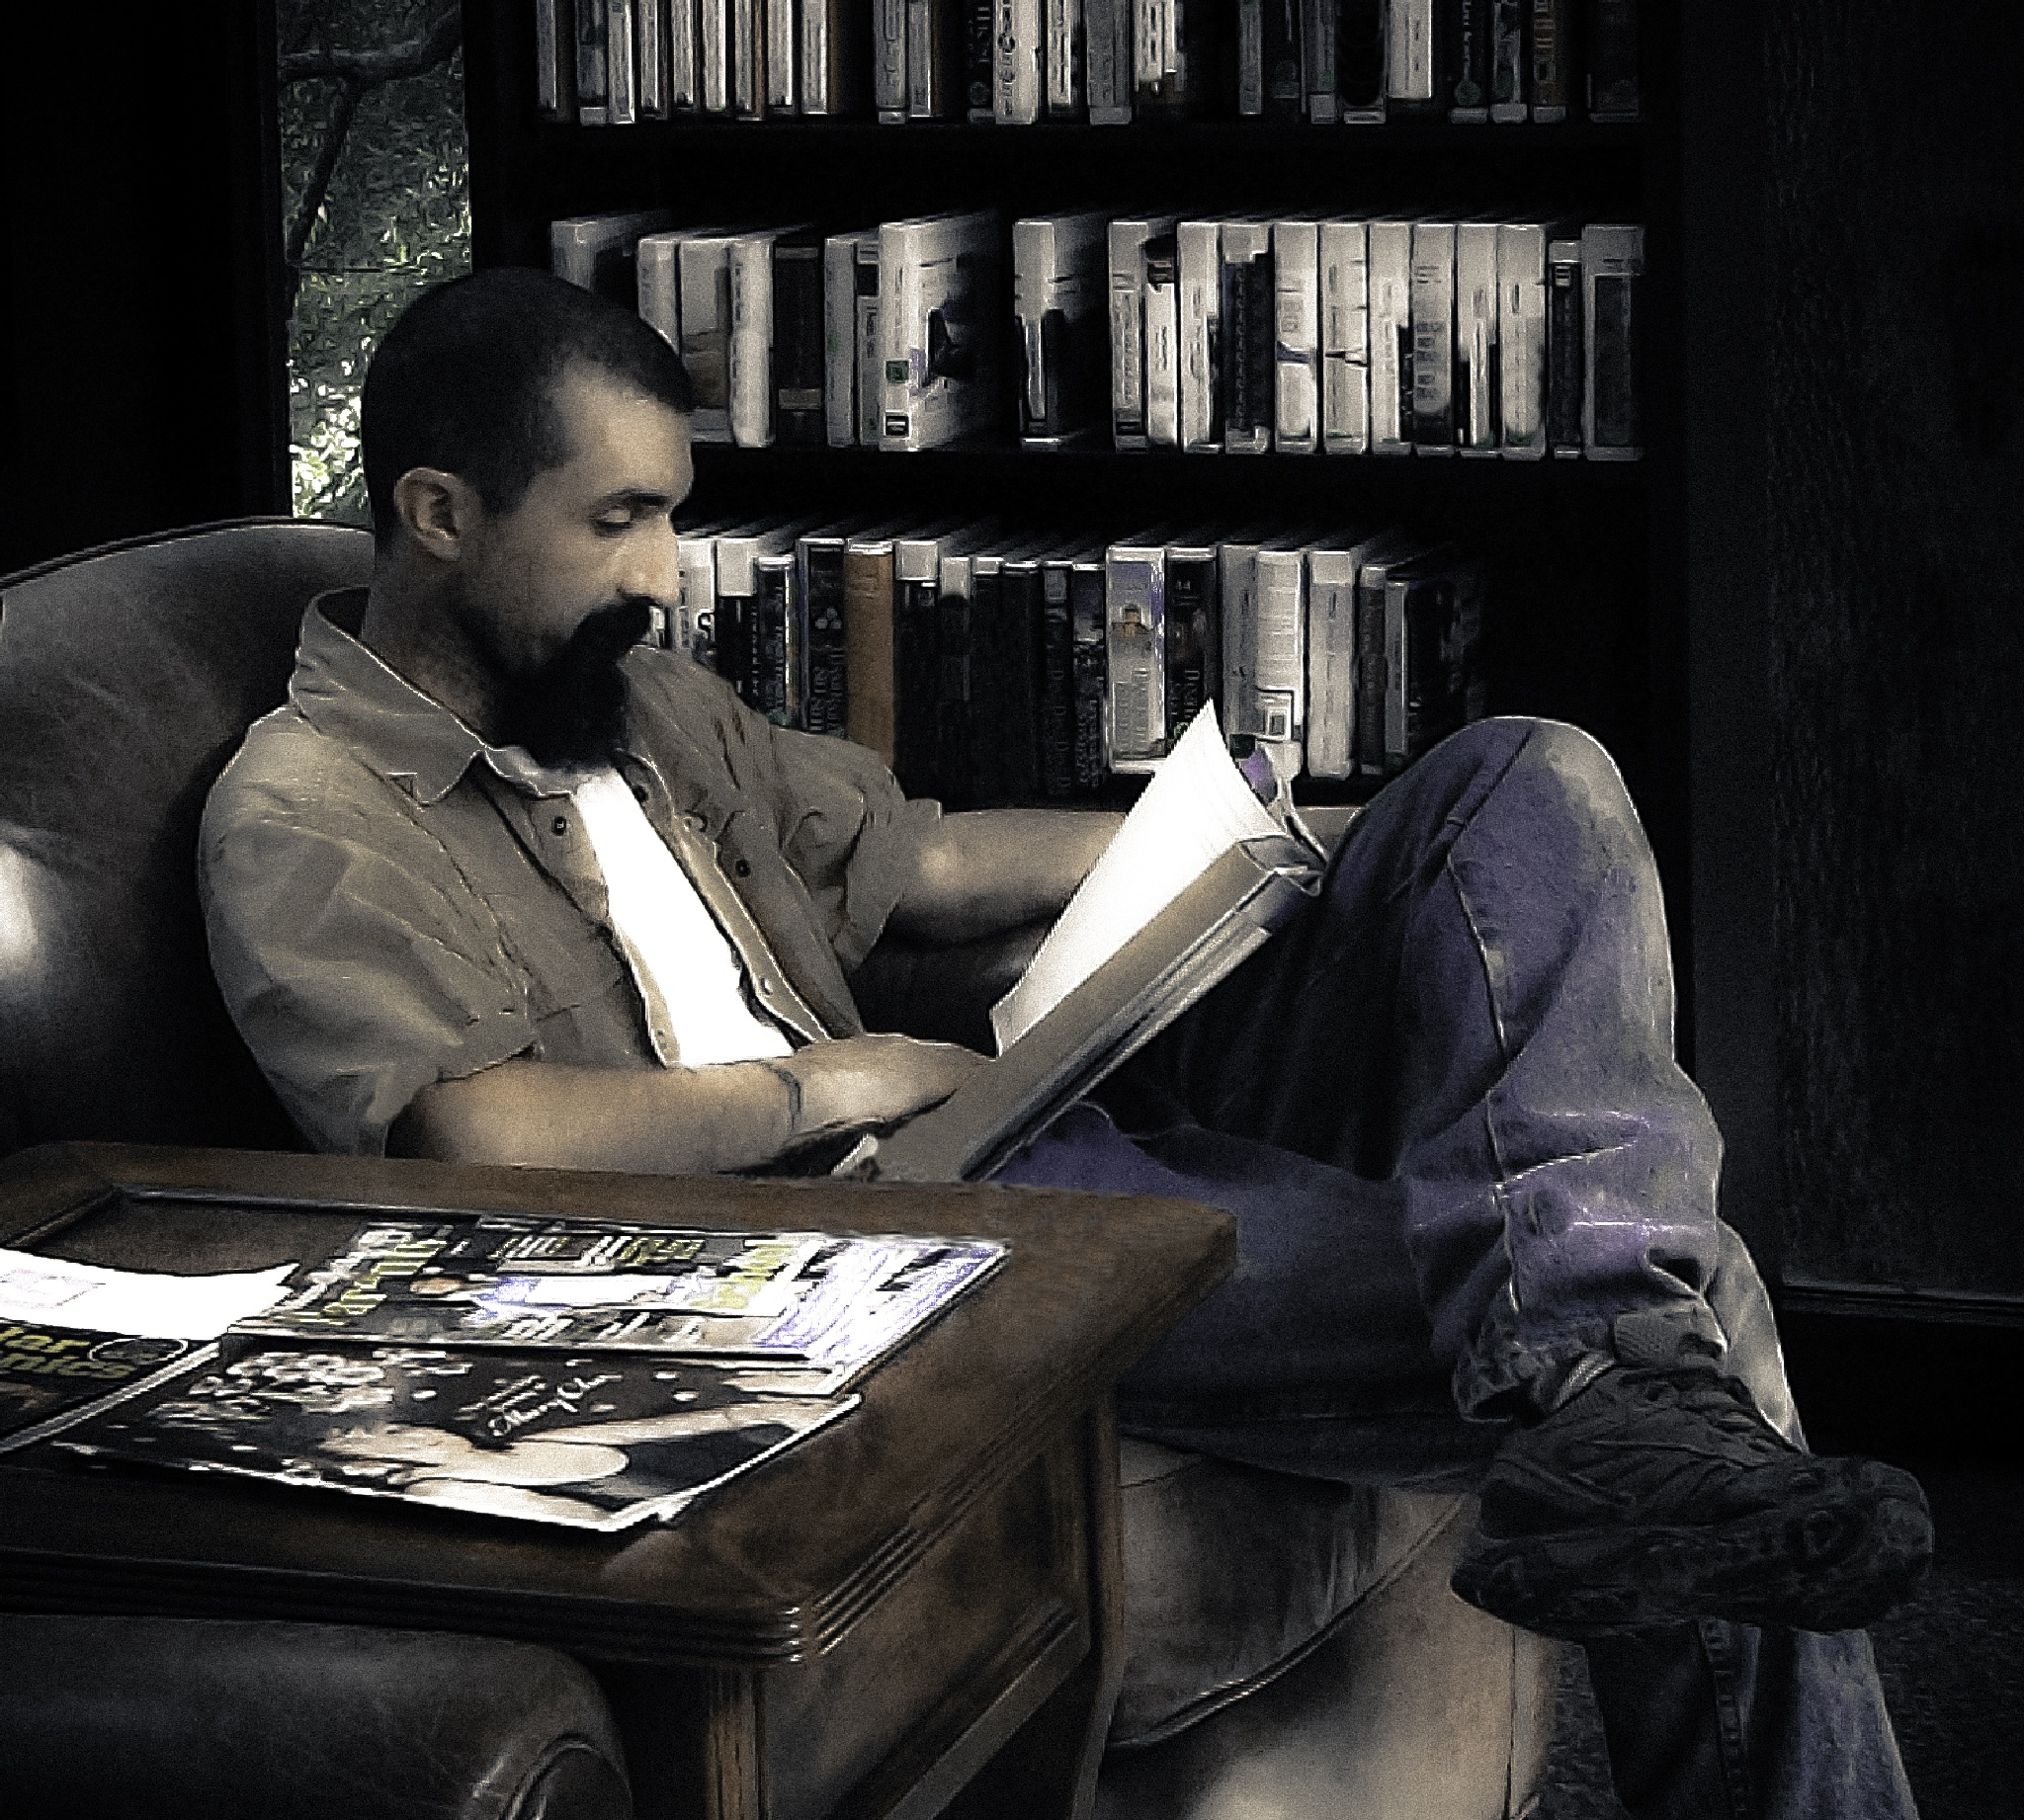 Enjoying a good read by Matthew Woodall